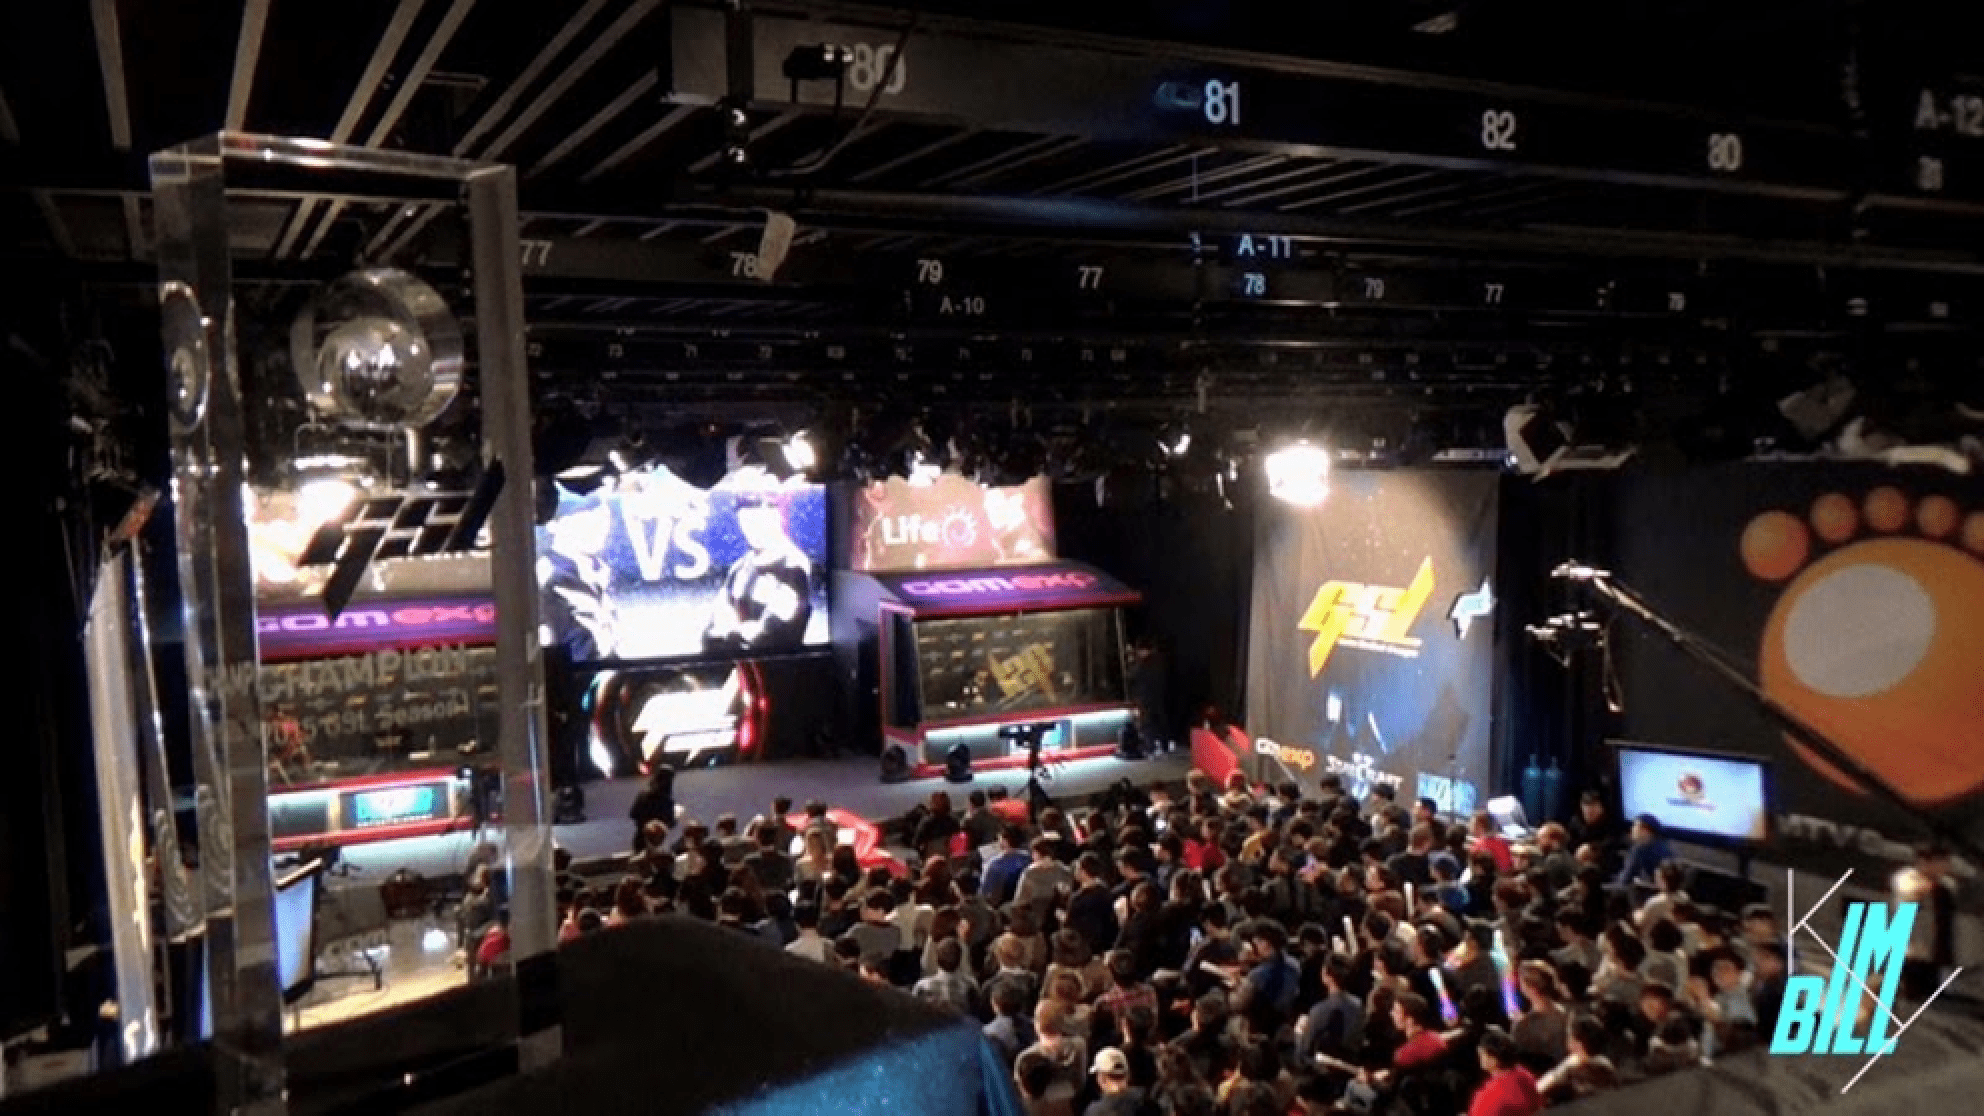 StarCraft II's longest running tournament series celebrates the 8th anniversary